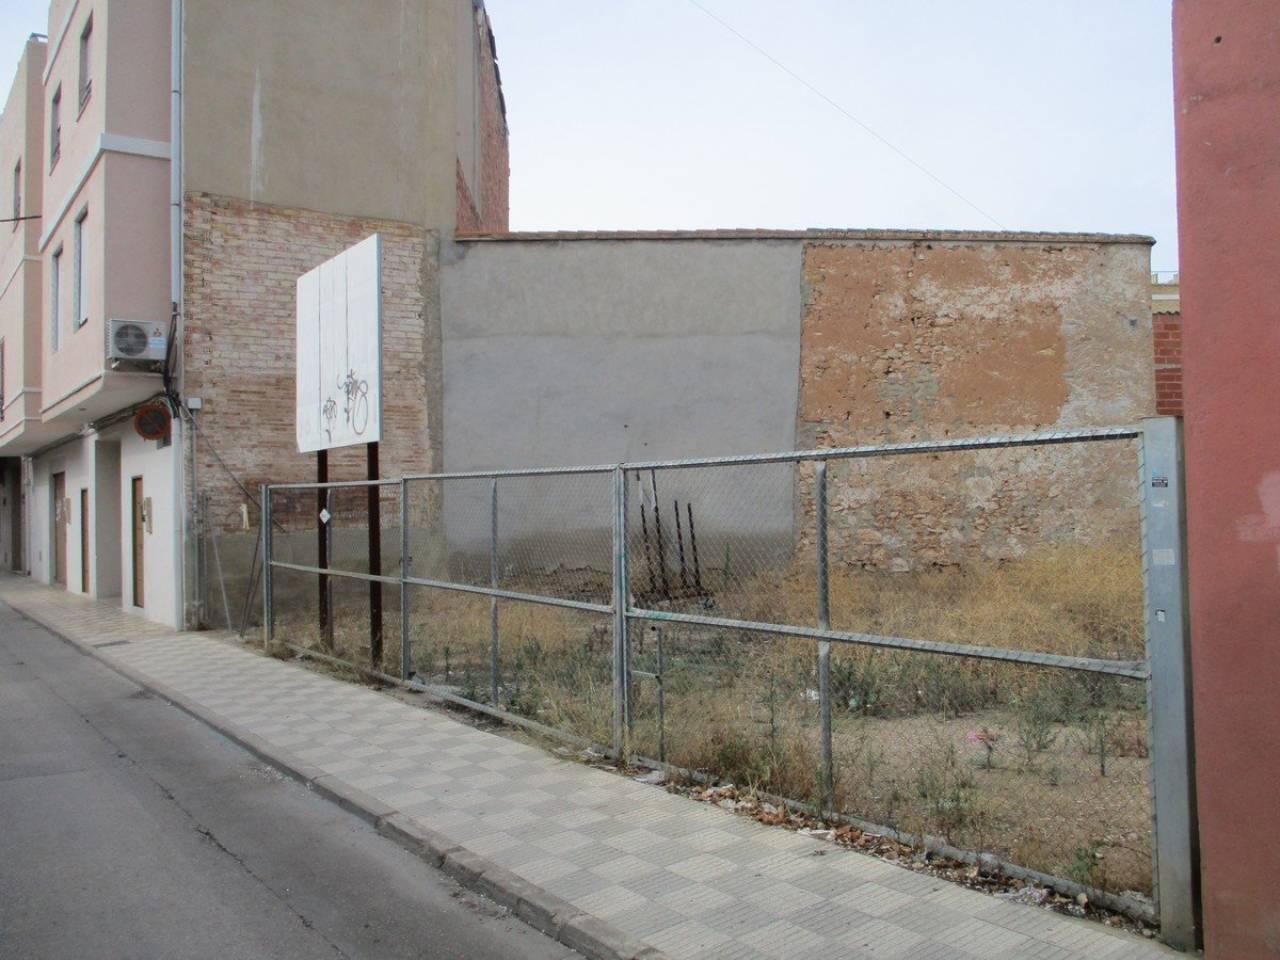 Solar urbano  Alcàsser. 98 m²,  449 m² solar, no cobramos honorarios banco.